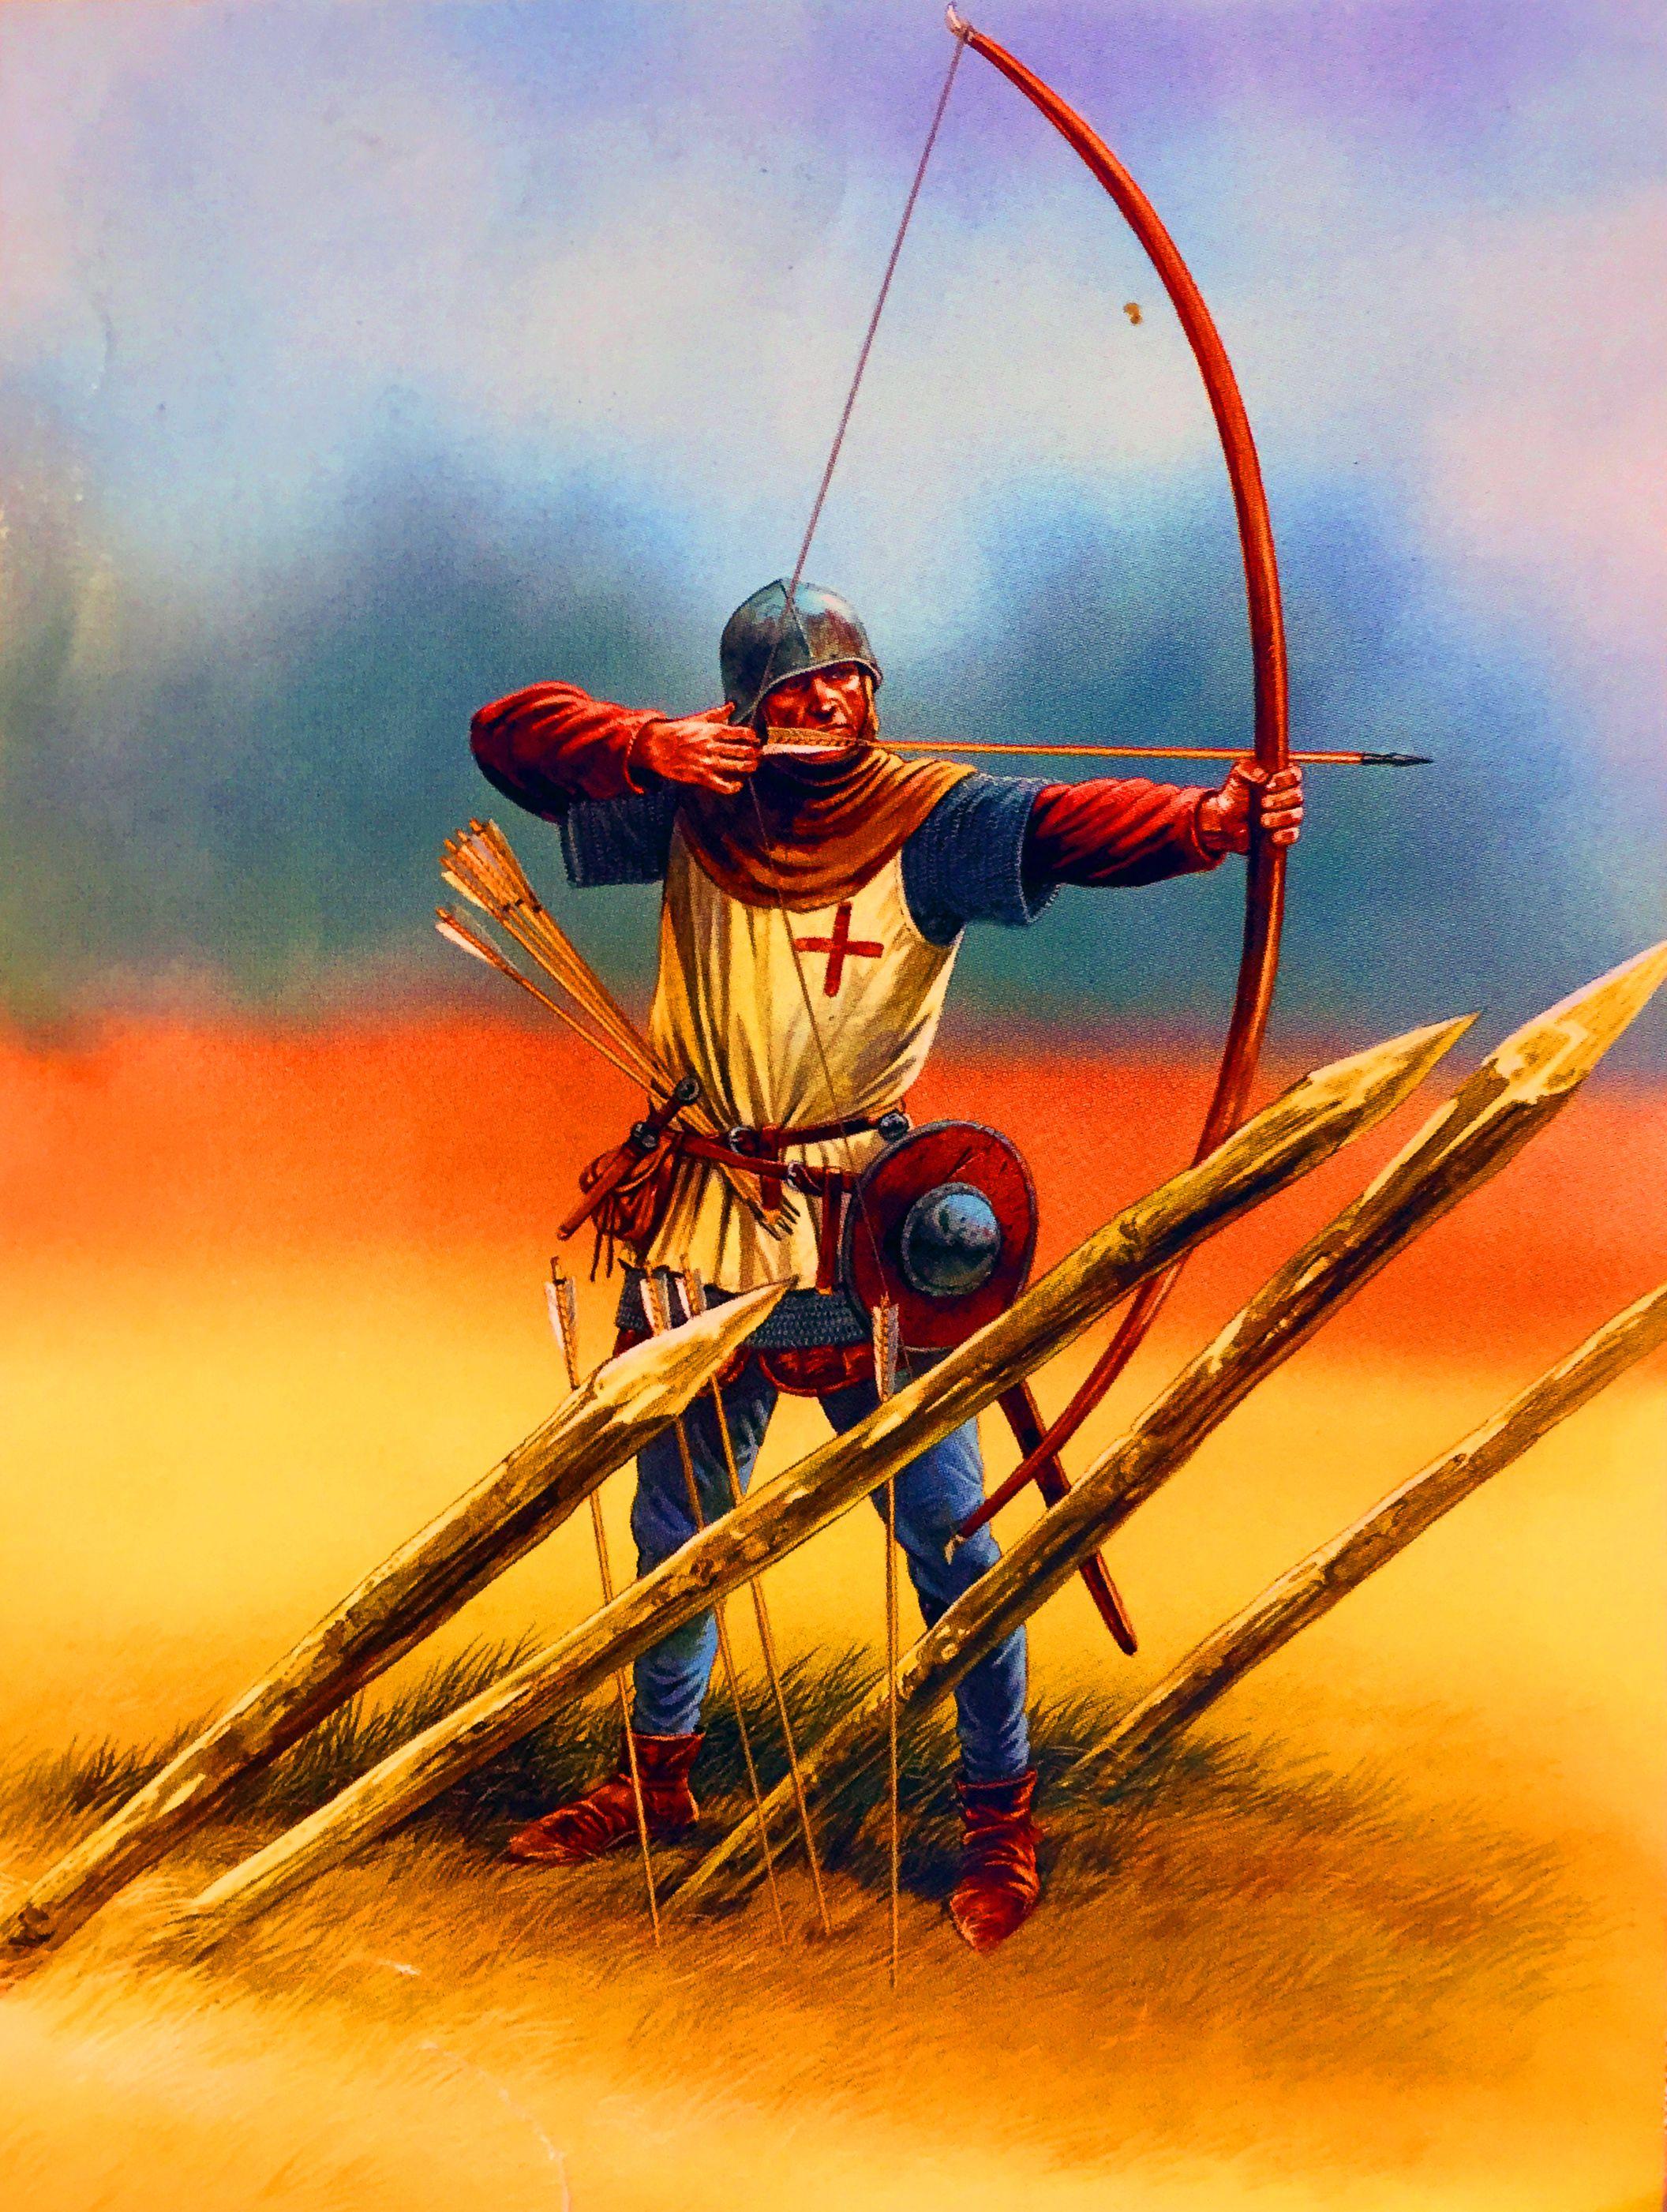 English Longbowman Hundred Years War